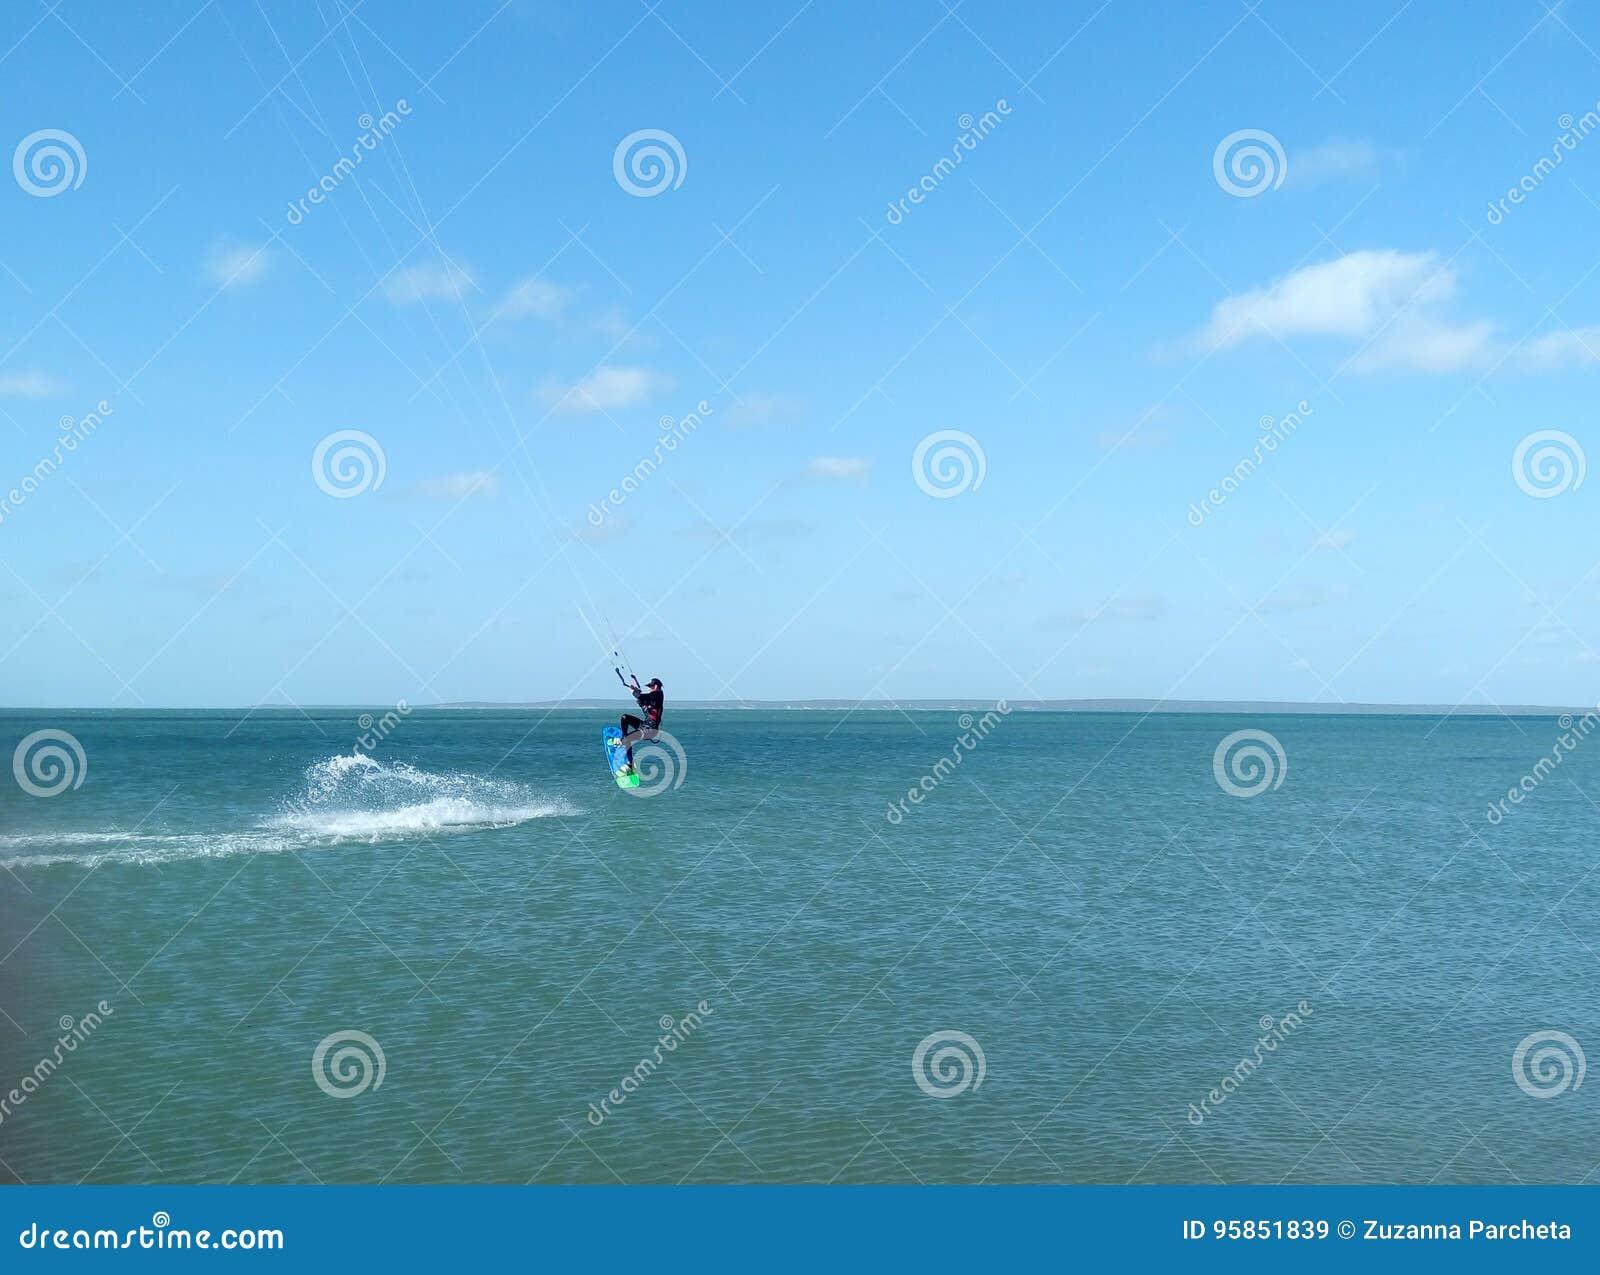 Man doing kitesurf